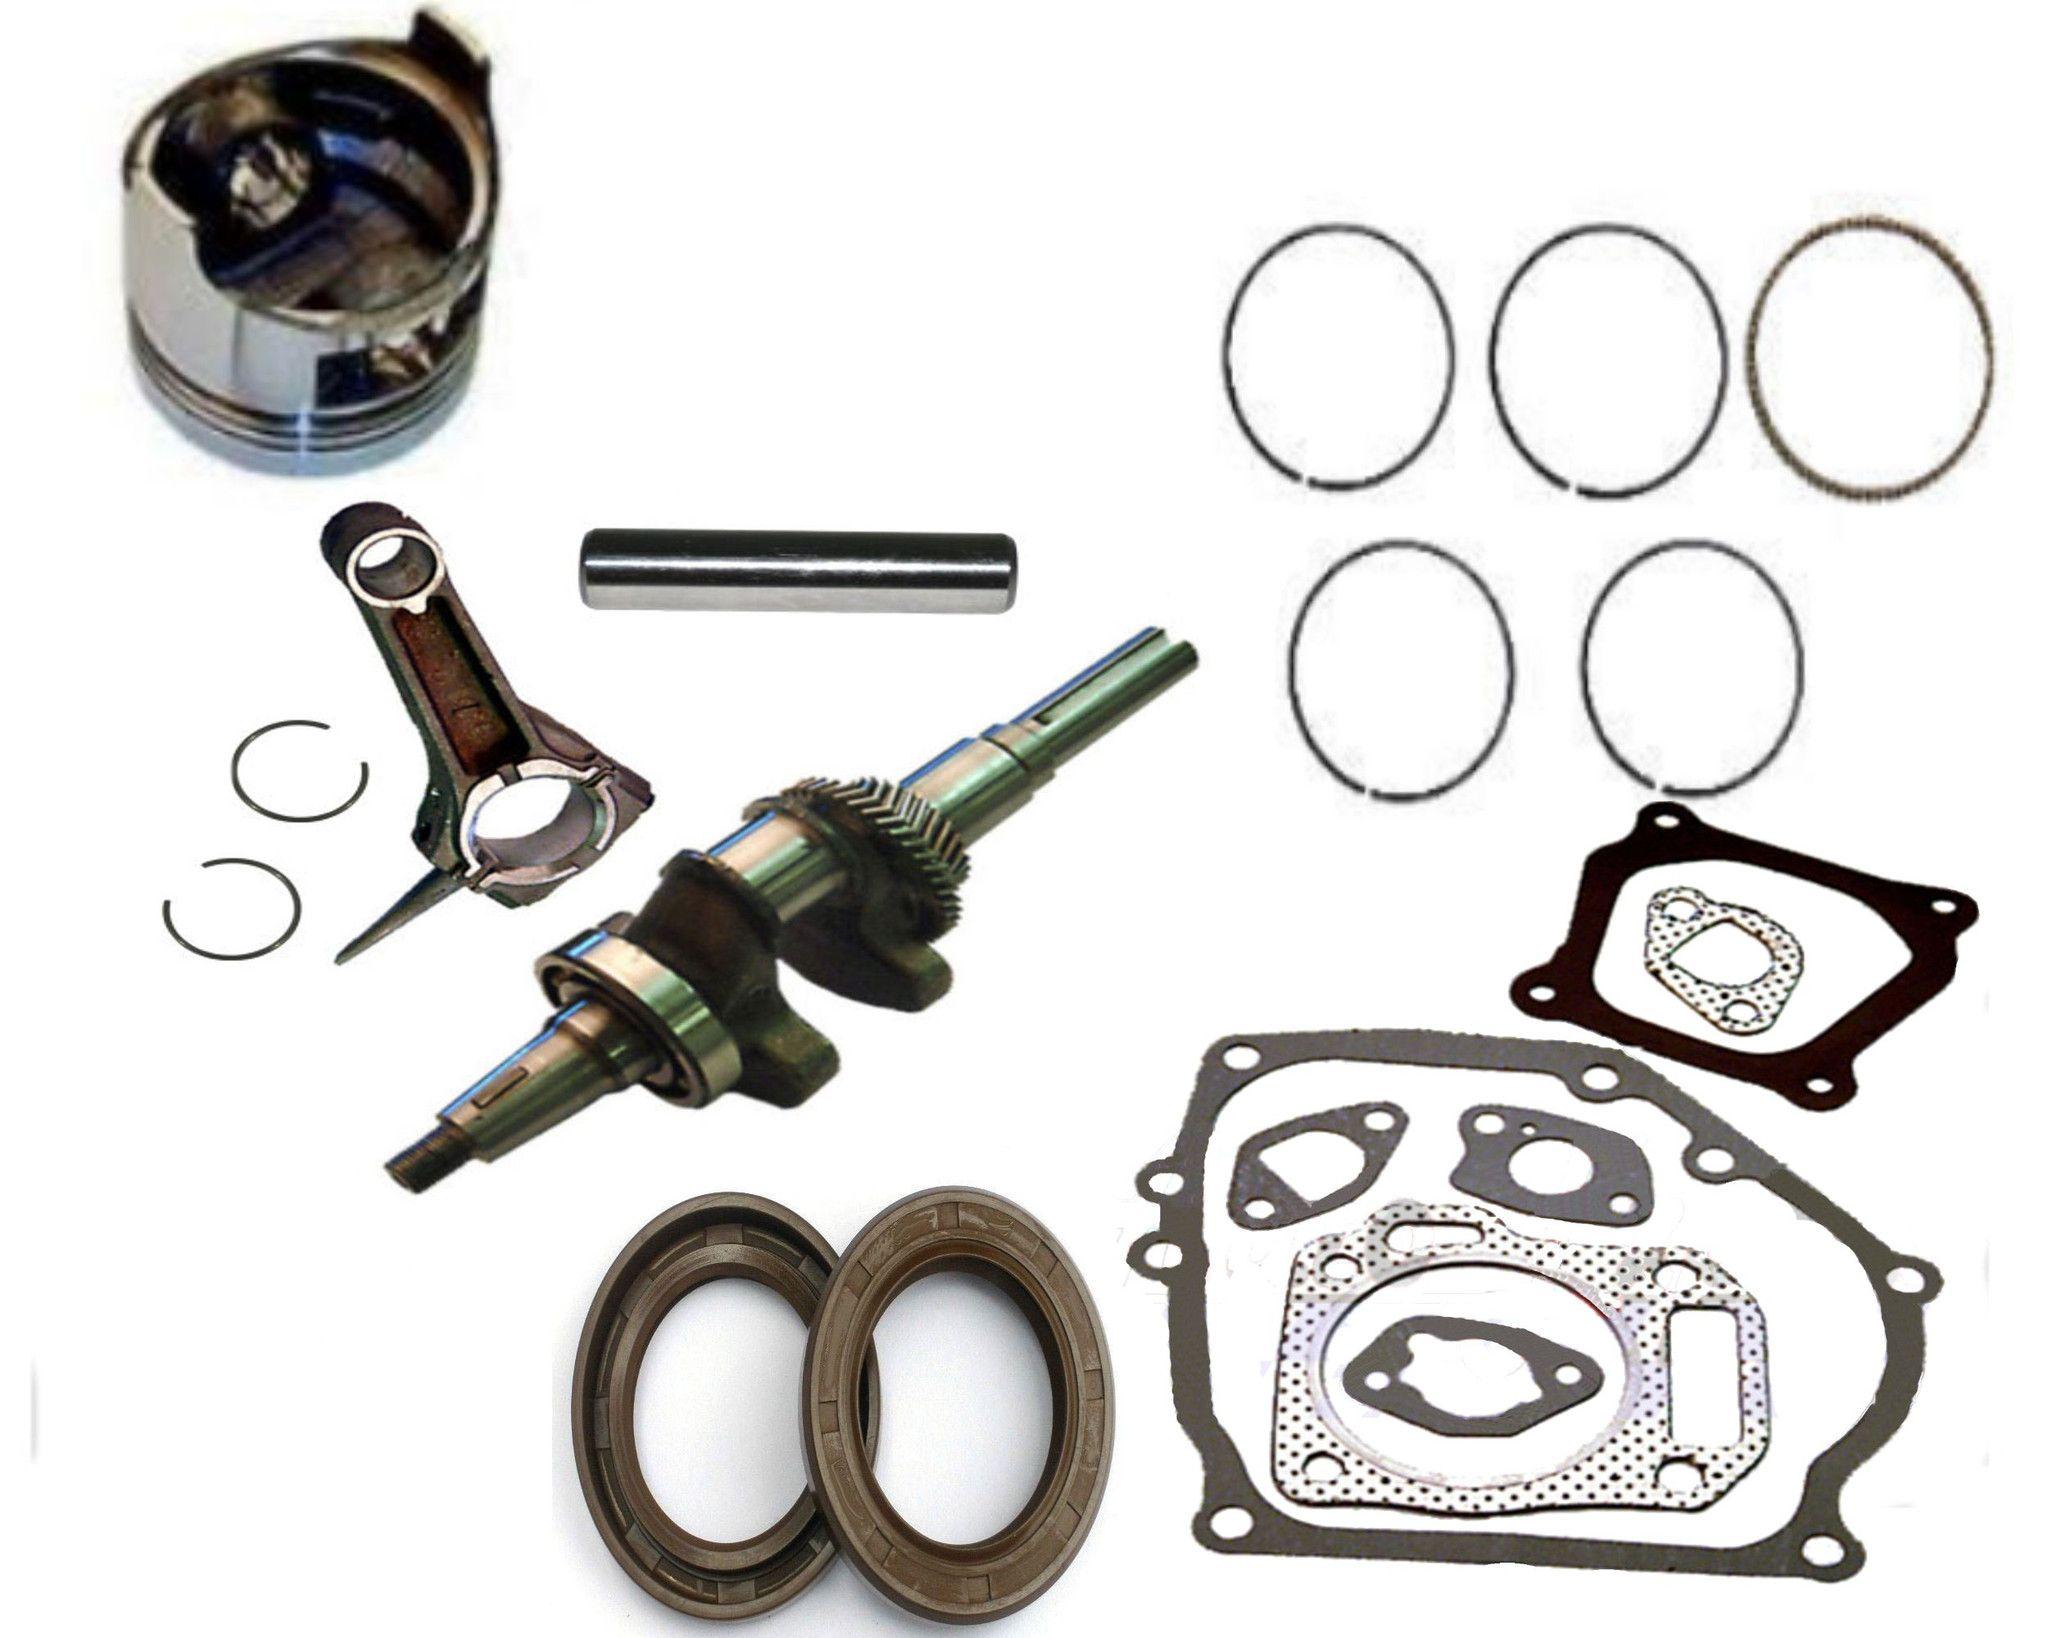 NEW FITS Honda GX160 5.5 hp PISTON AND RING CONNECTING ROD CRANKSHAFT 5.5 ENGINE